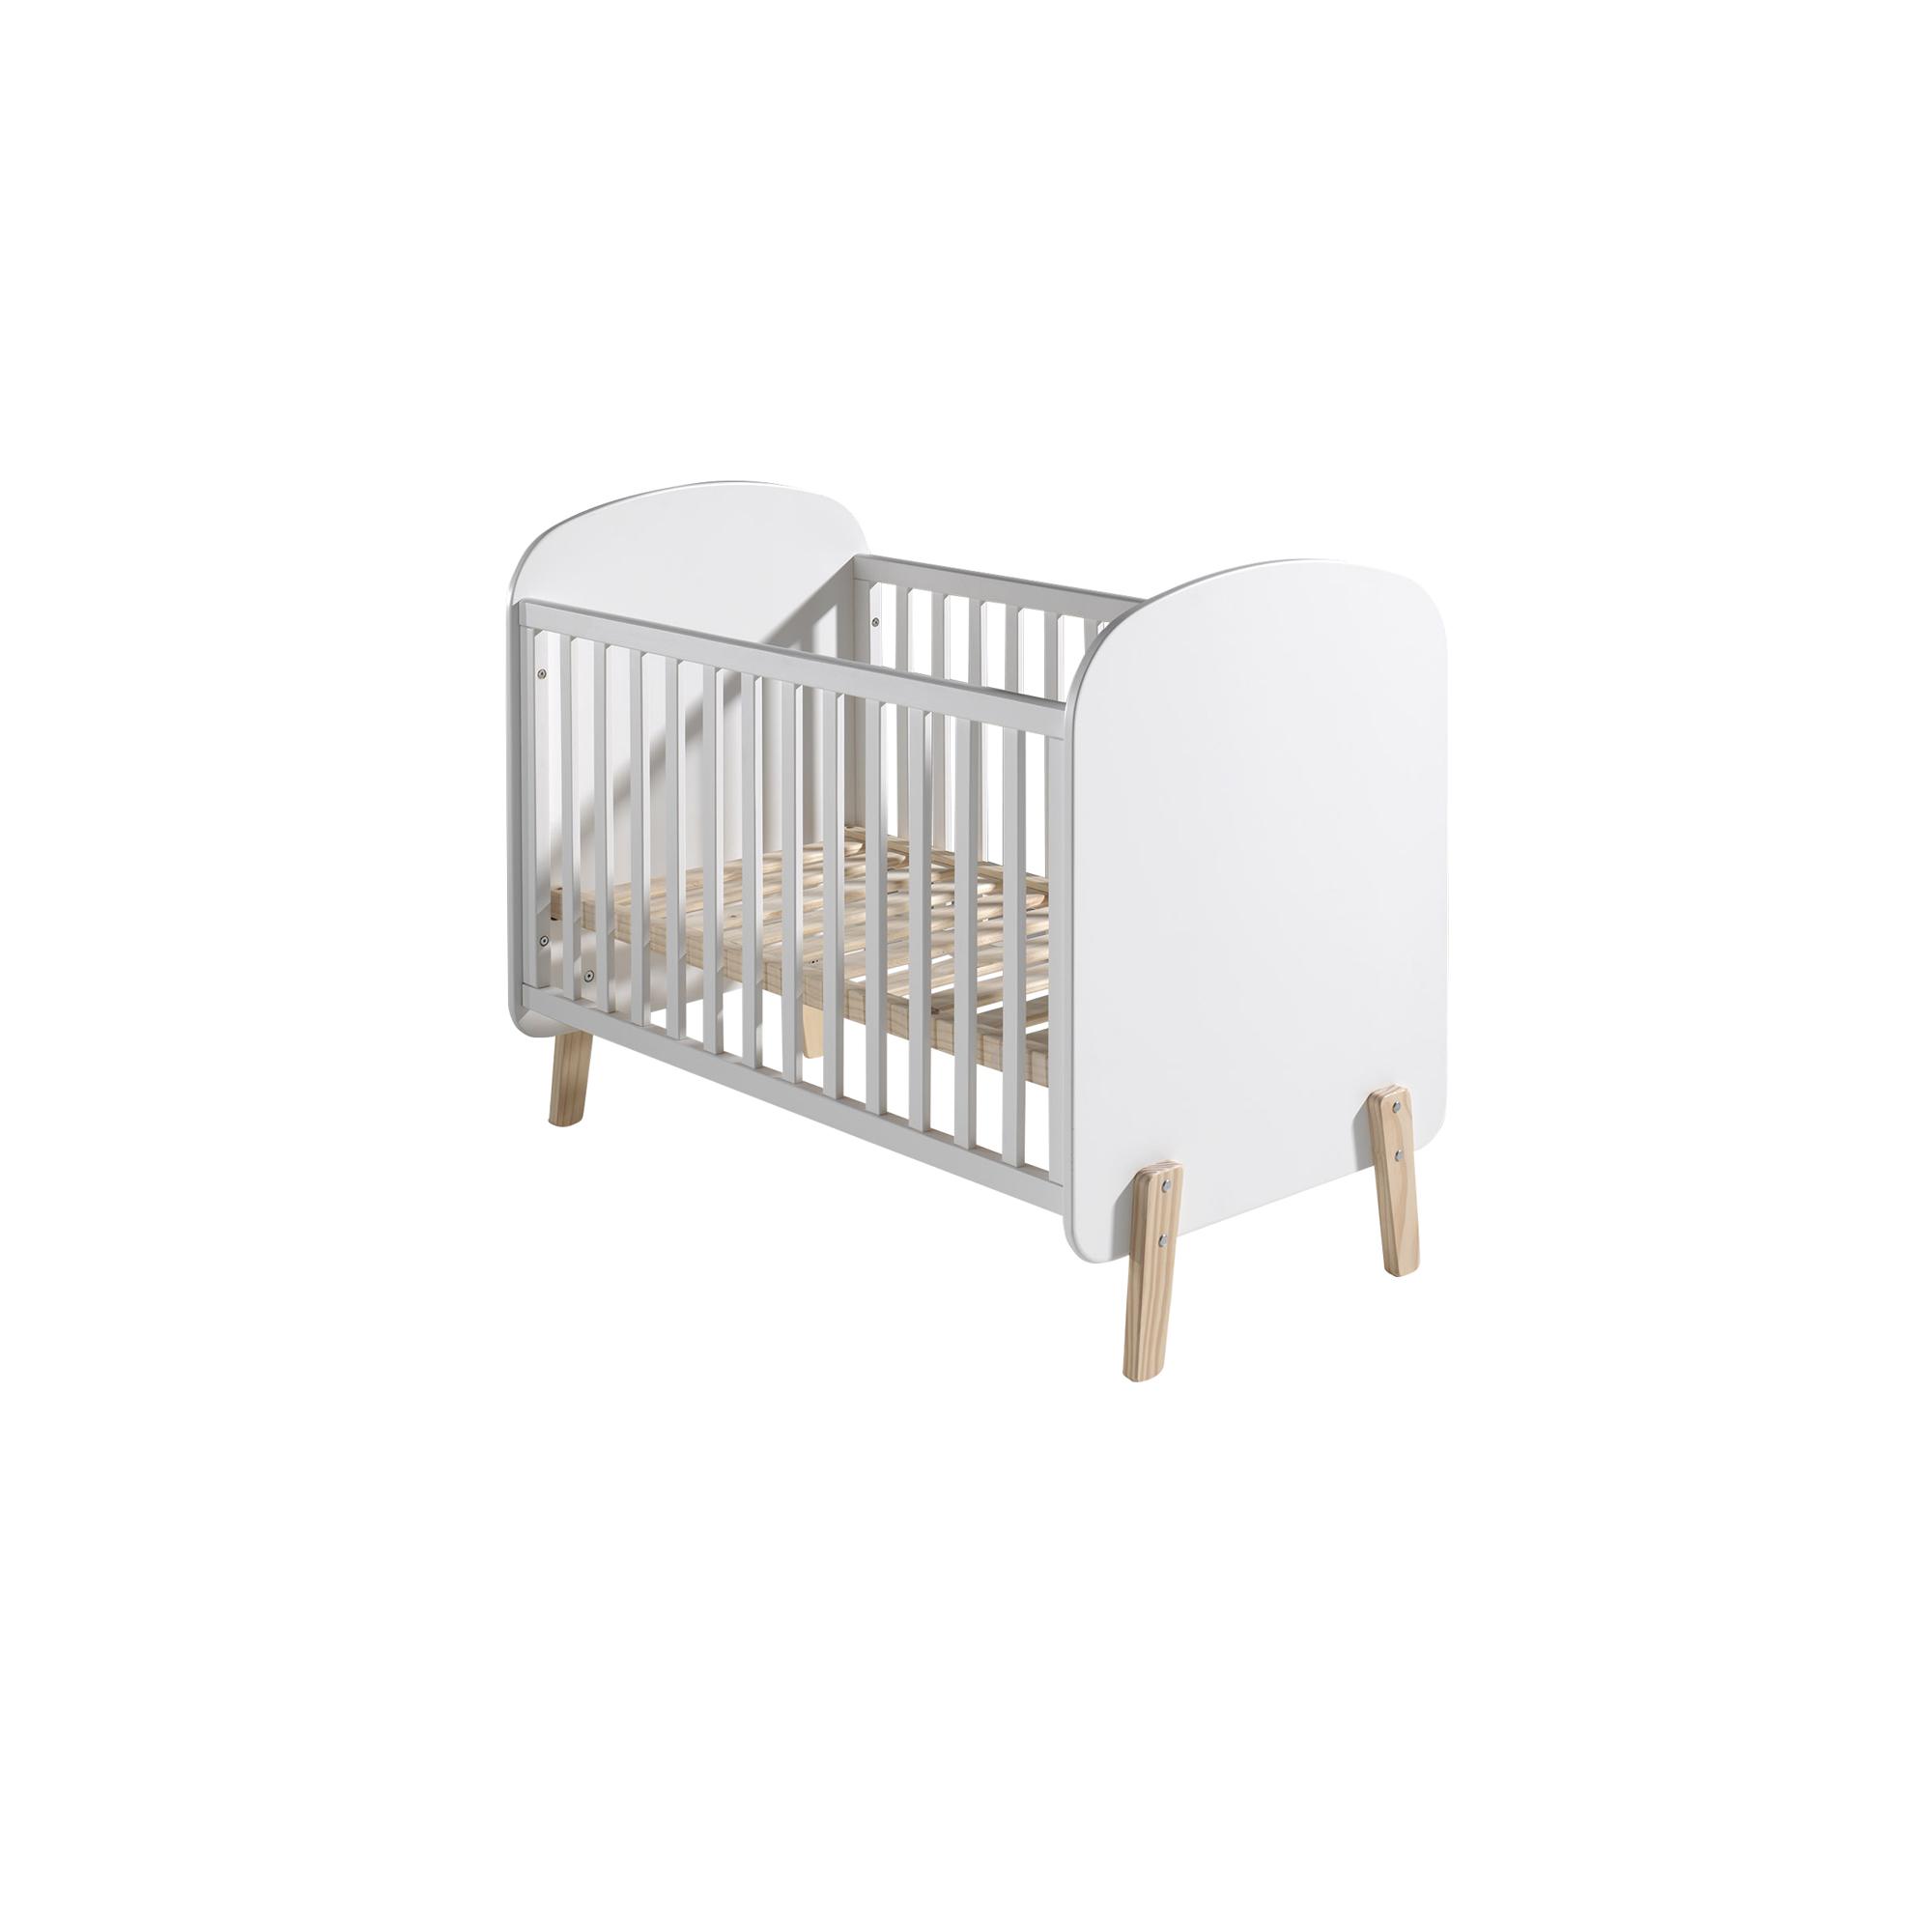 babybett kiddy liegefl che 60 x 120 cm wei kinder jugendzimmer kiddy. Black Bedroom Furniture Sets. Home Design Ideas